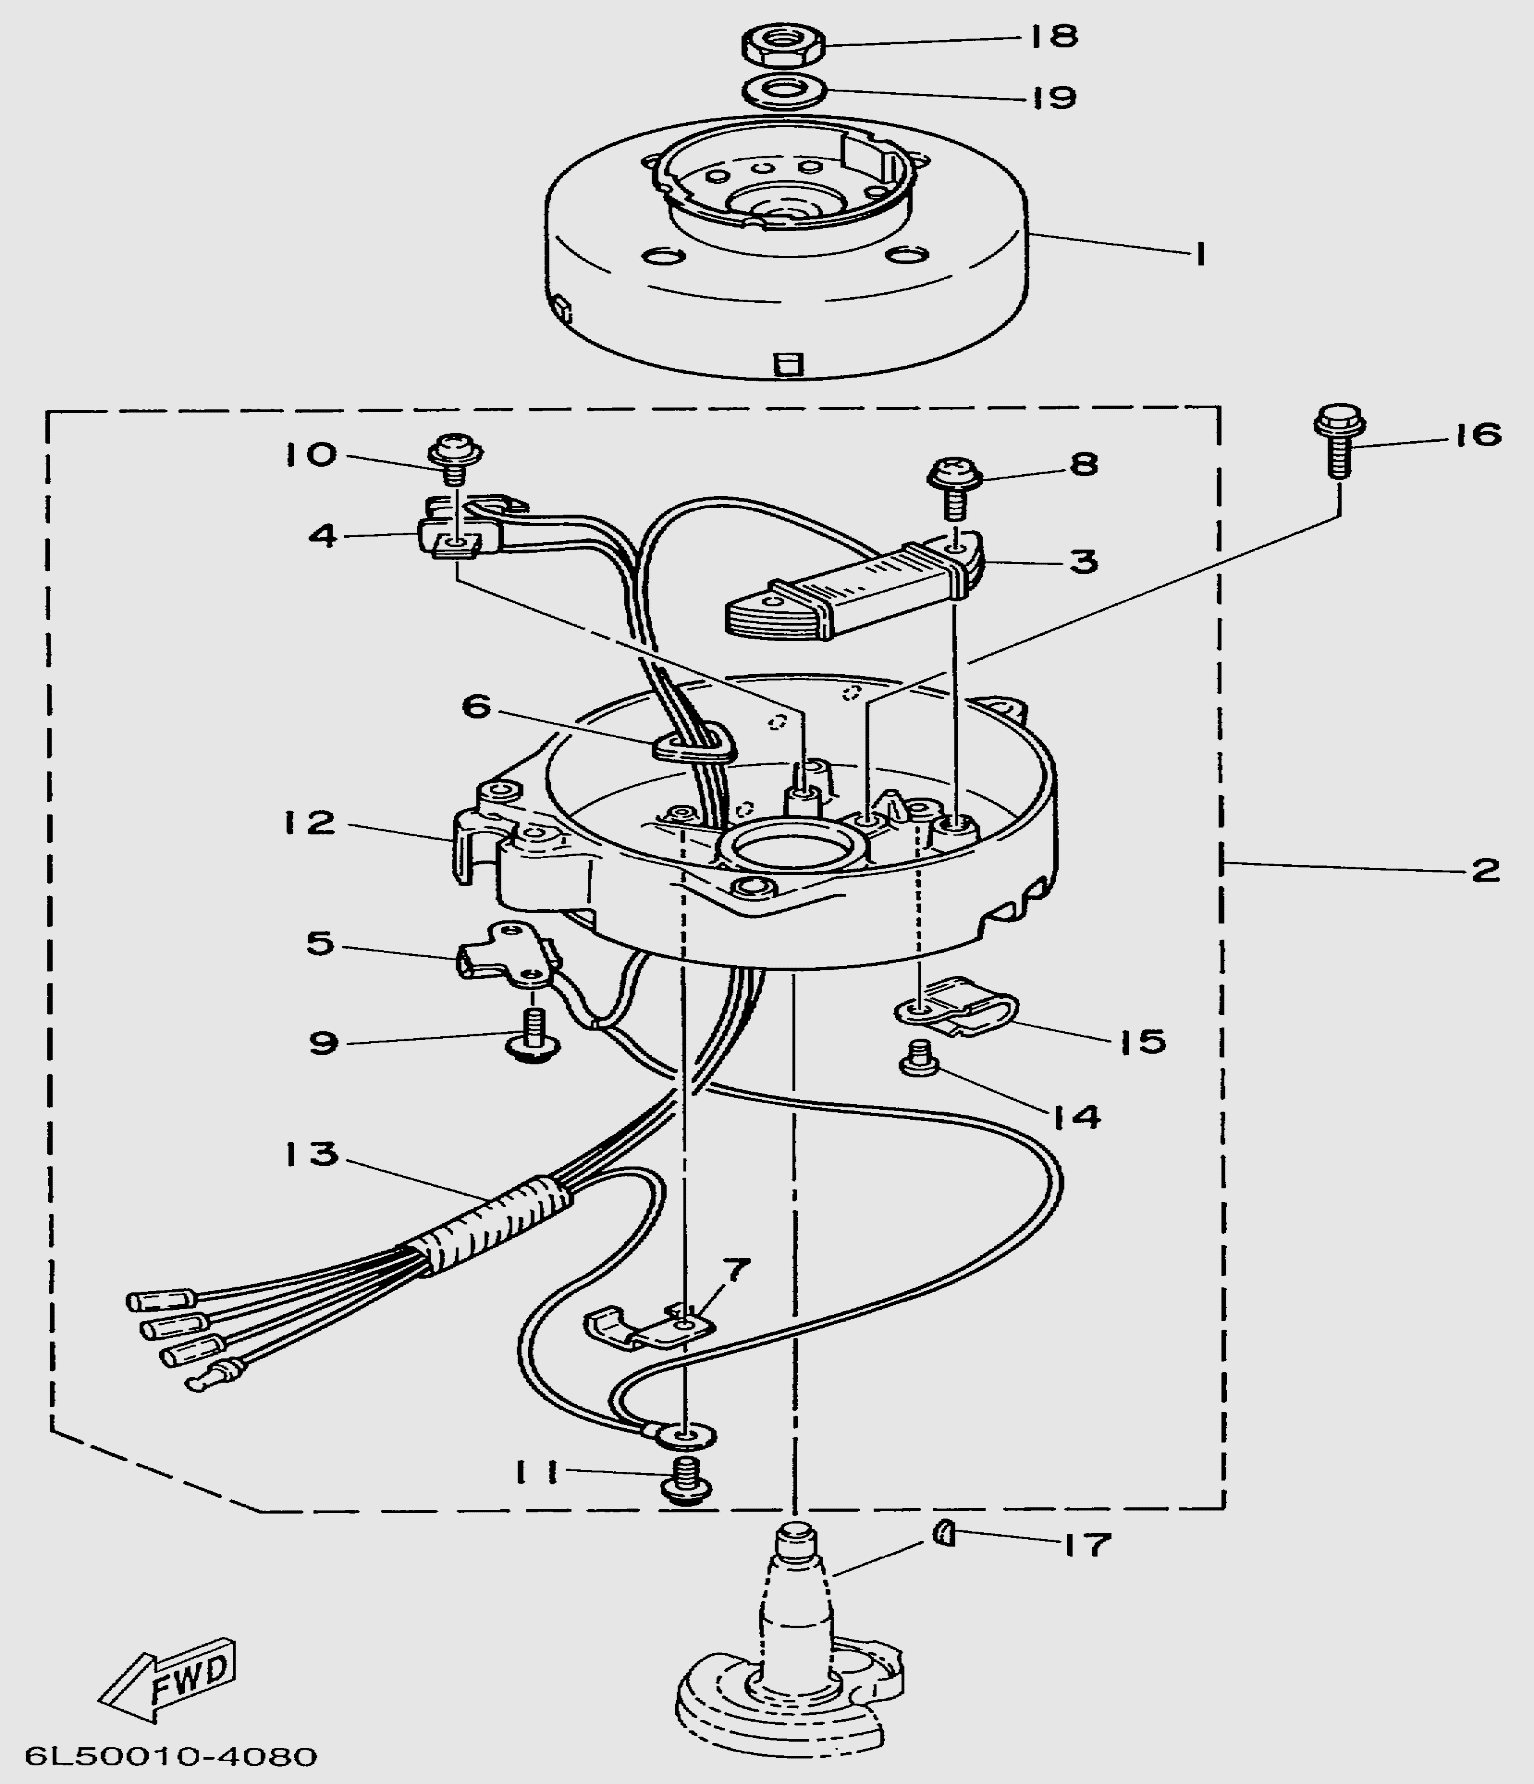 Запчасти генератора лодочного мотора T3S SEA-PRO